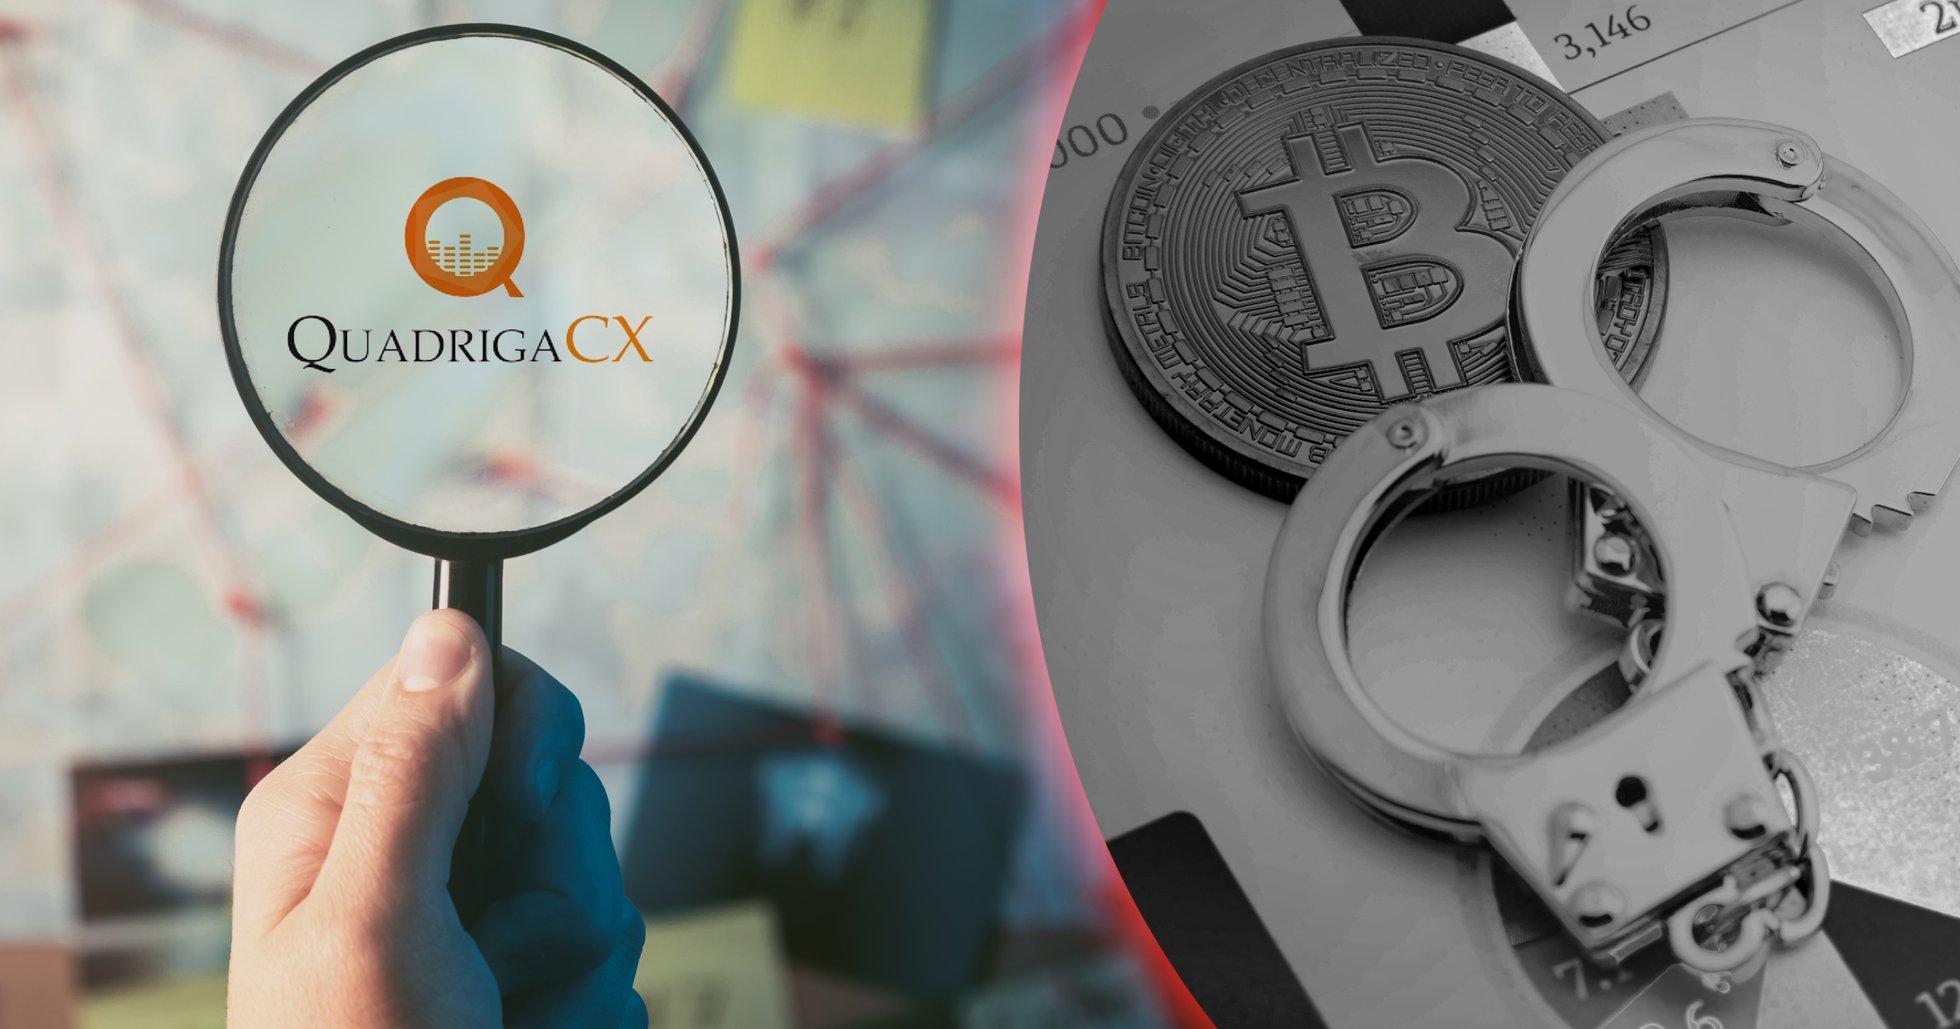 Quadrigacx mystiska konkurs har utretts – döda grundaren bedrev ett ponzibedrägeri